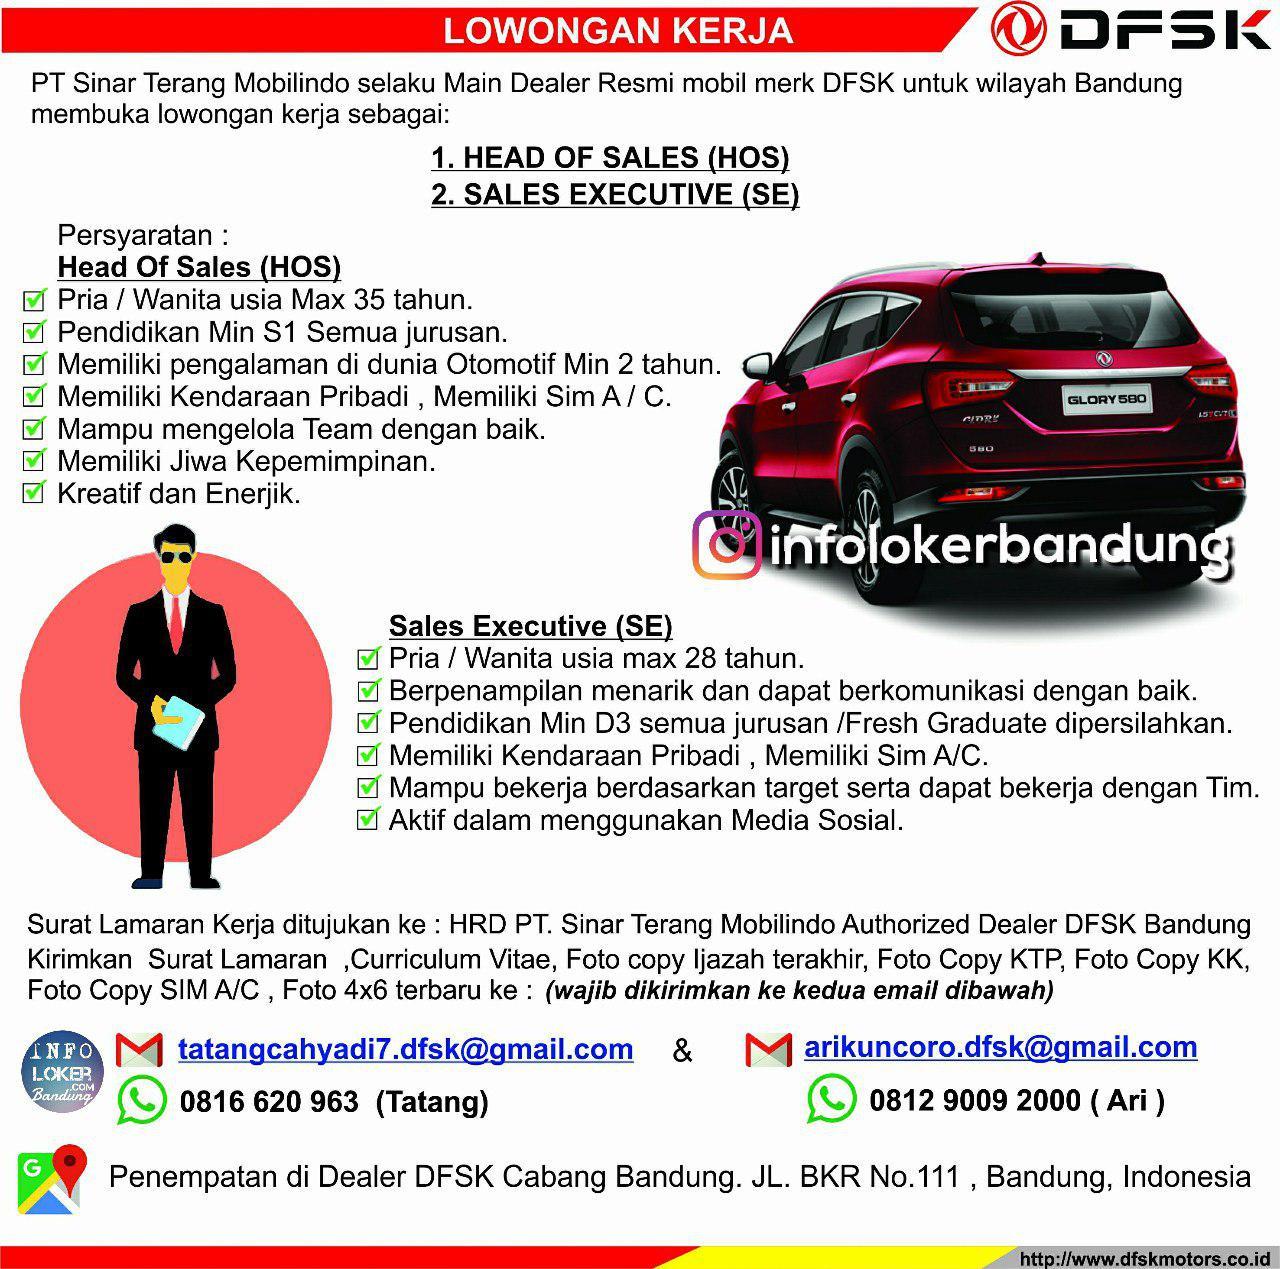 Lowongan Kerja PT. Sinar Terang Mobilindo ( DFSK Mobil ) Bandung Agustus 2018 - infolokerbandung.com